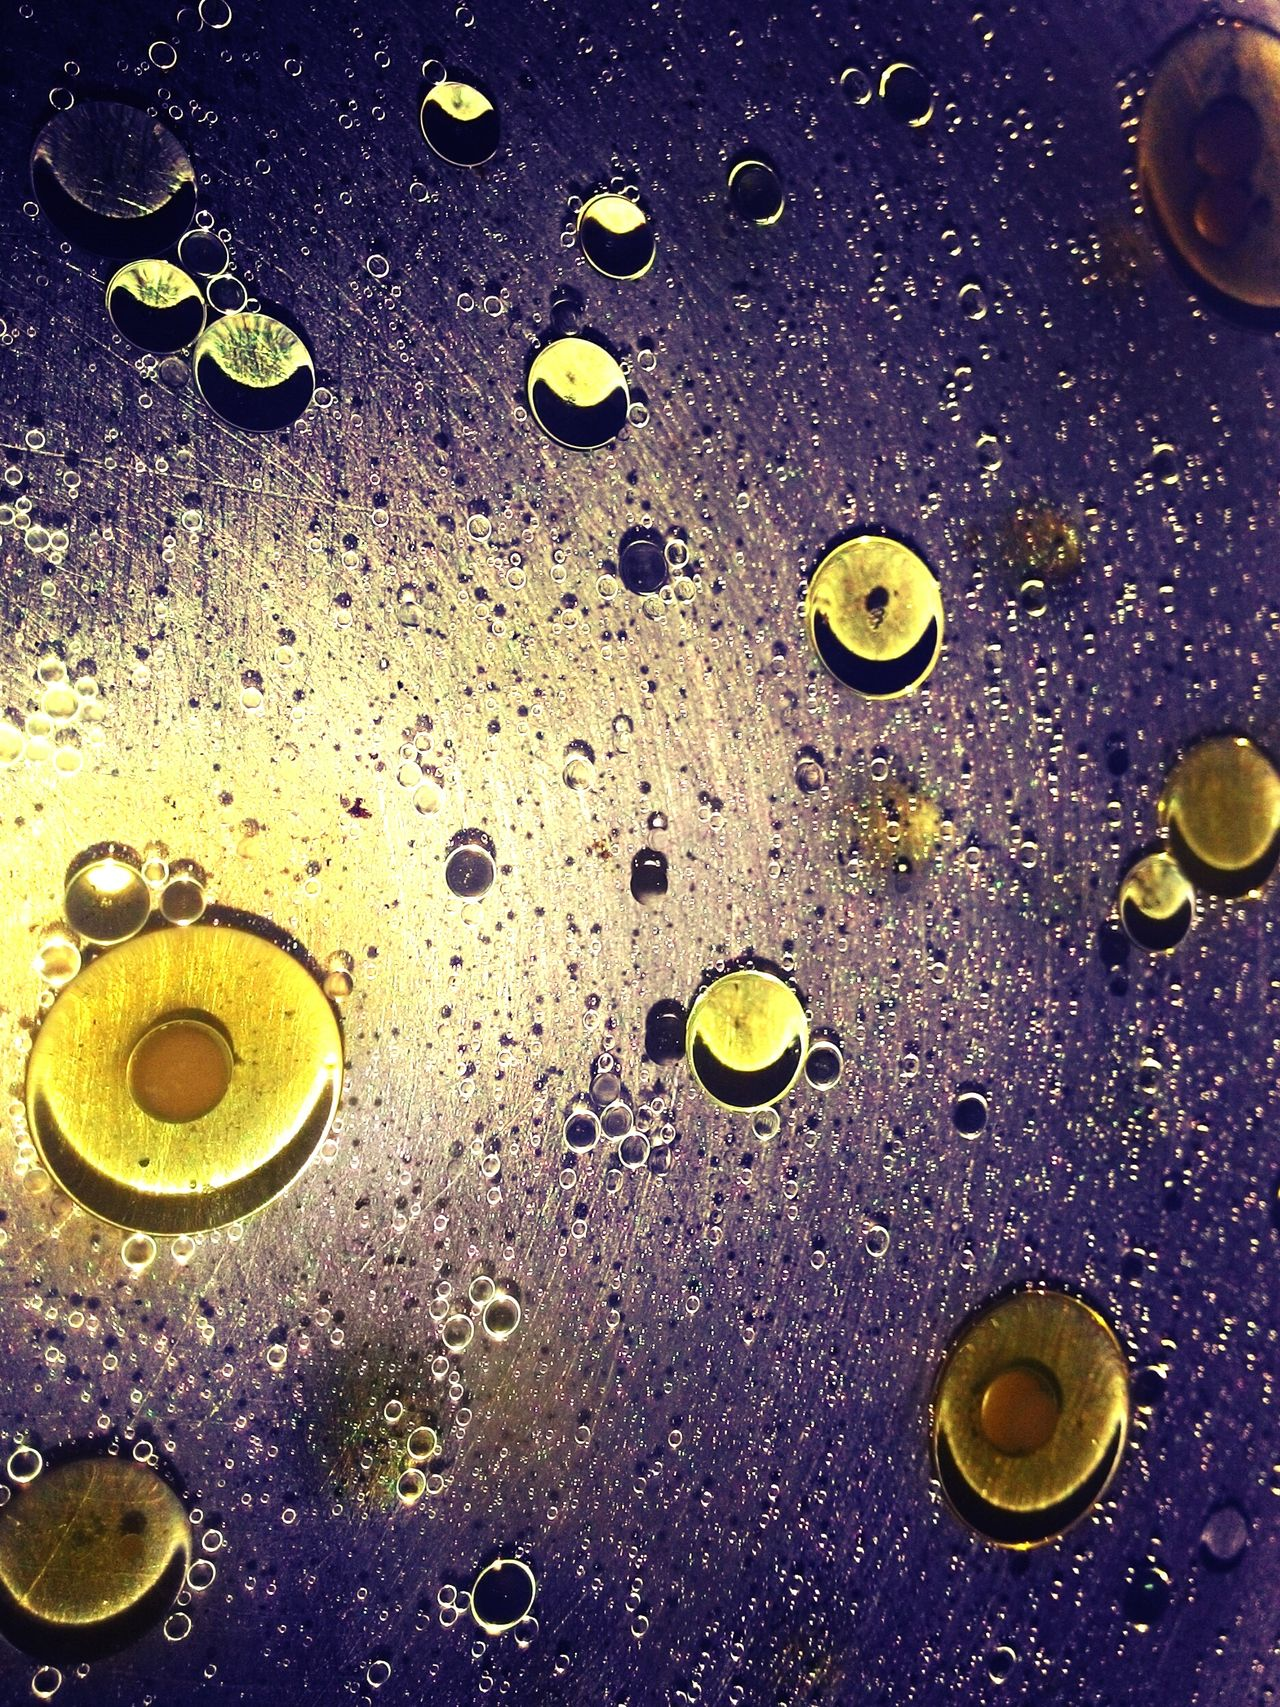 Maximum Closeness Oil Oil In Water Globules Science